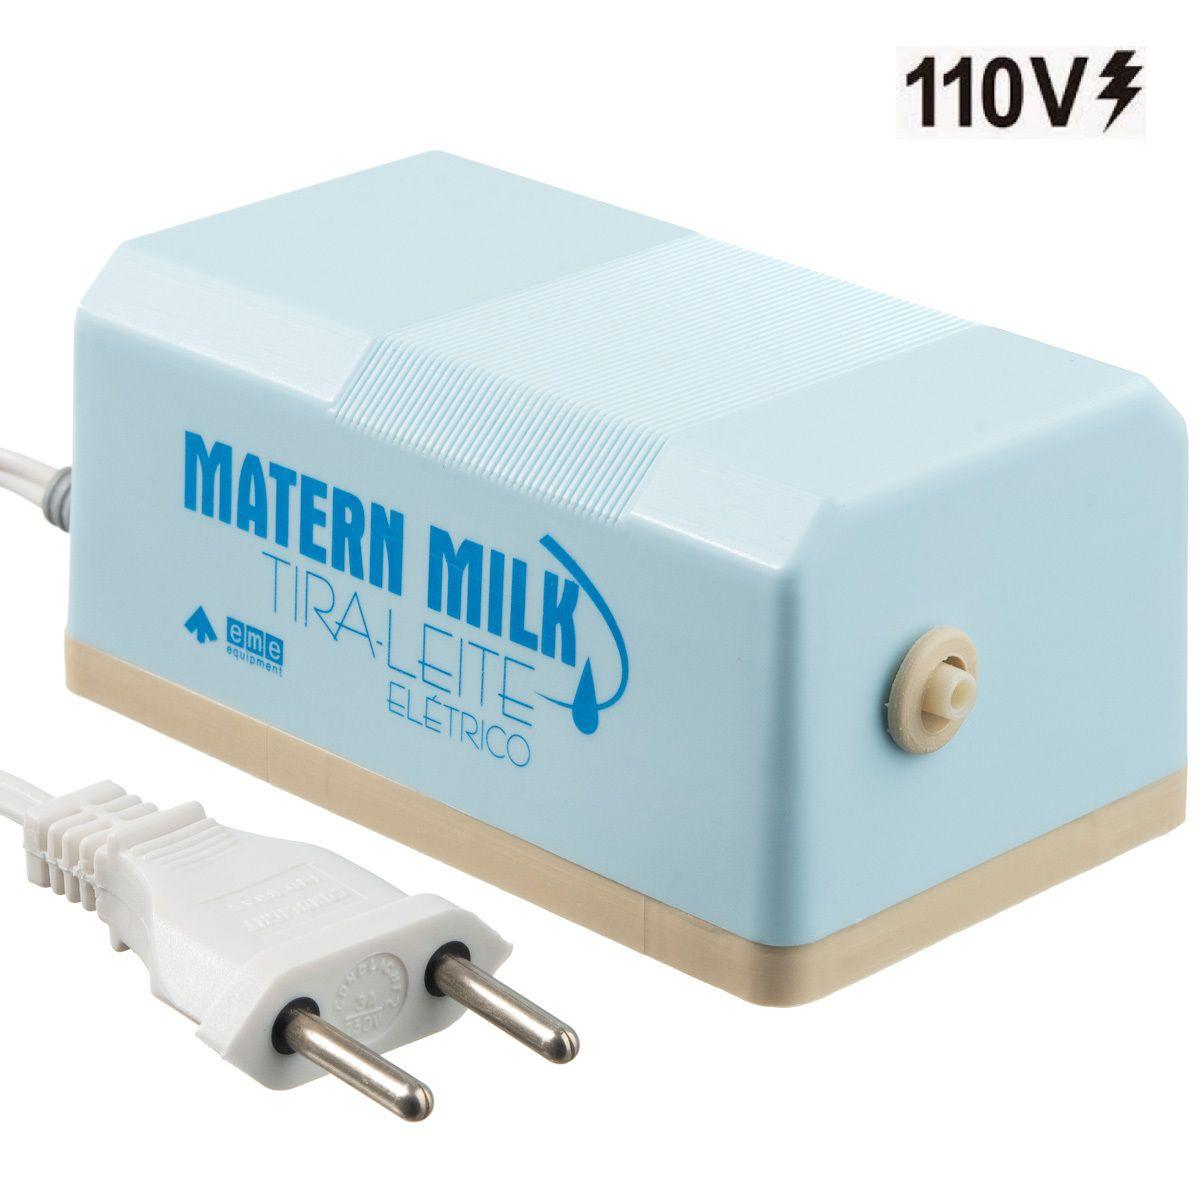 Bomba tira leite elétrico 110 V - Azul - Matern Milk